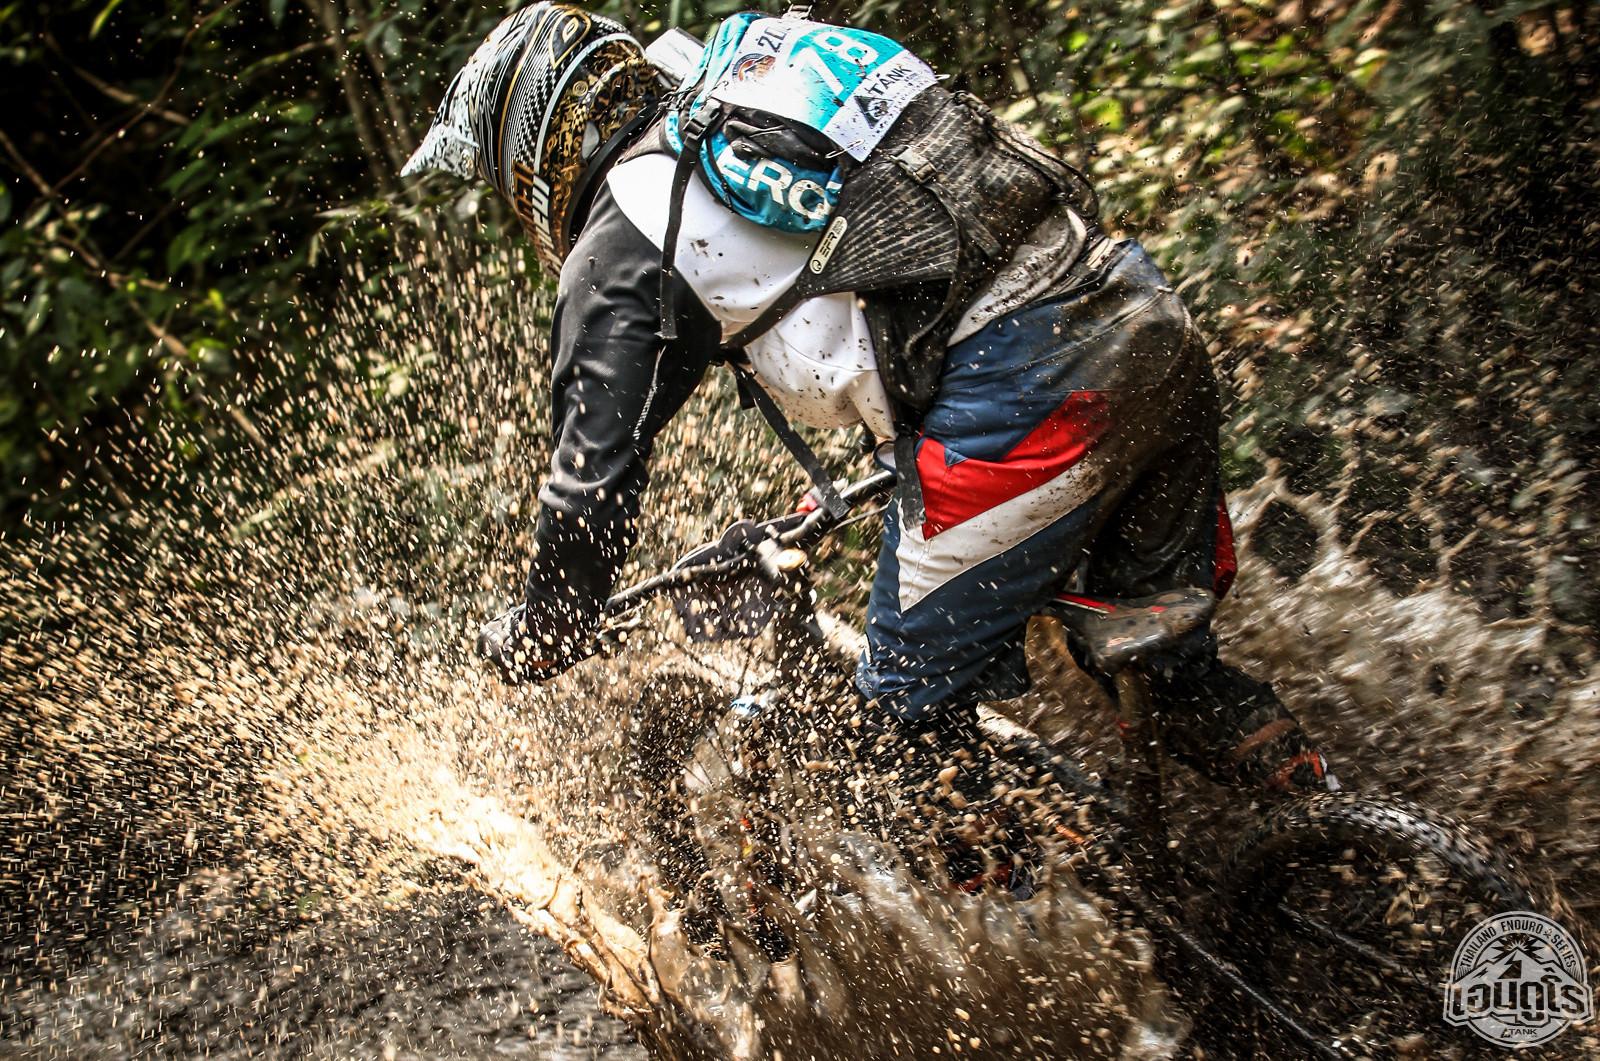 Muddy Splash - TANK01 - Mountain Biking Pictures - Vital MTB